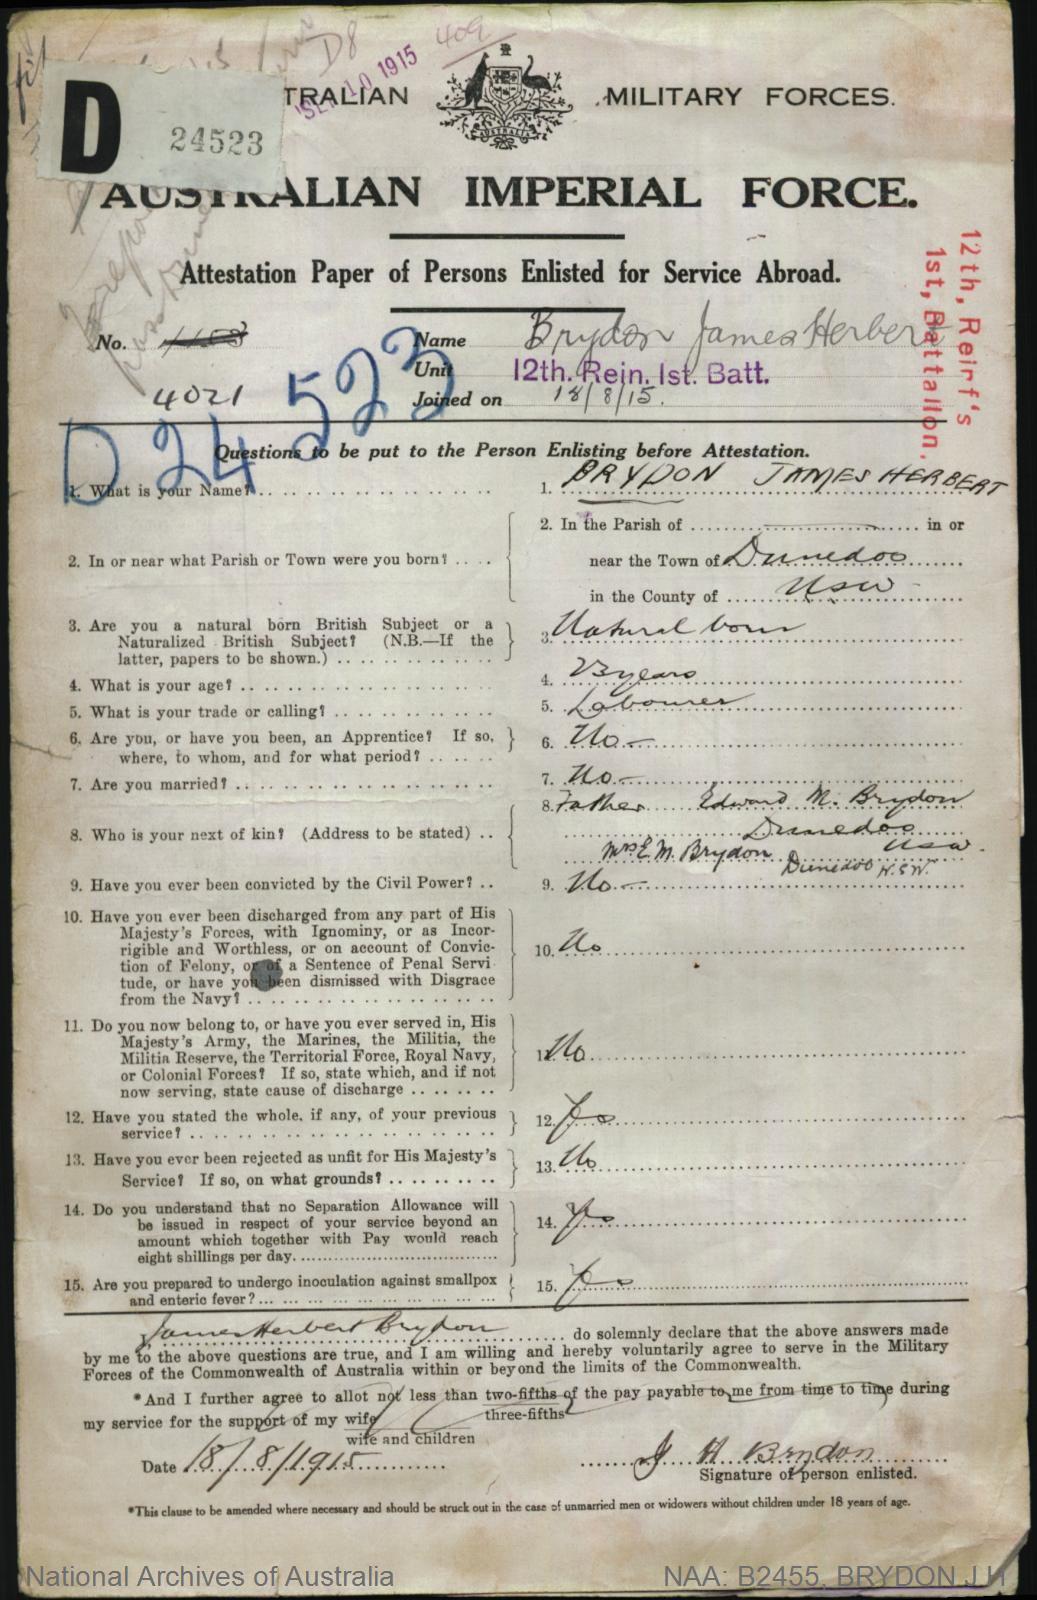 Brydon James Herbert : SERN 4021 4153 : POB Dunedoo NSW : POE Lithgow NSW : NOK F Brydon Edward M